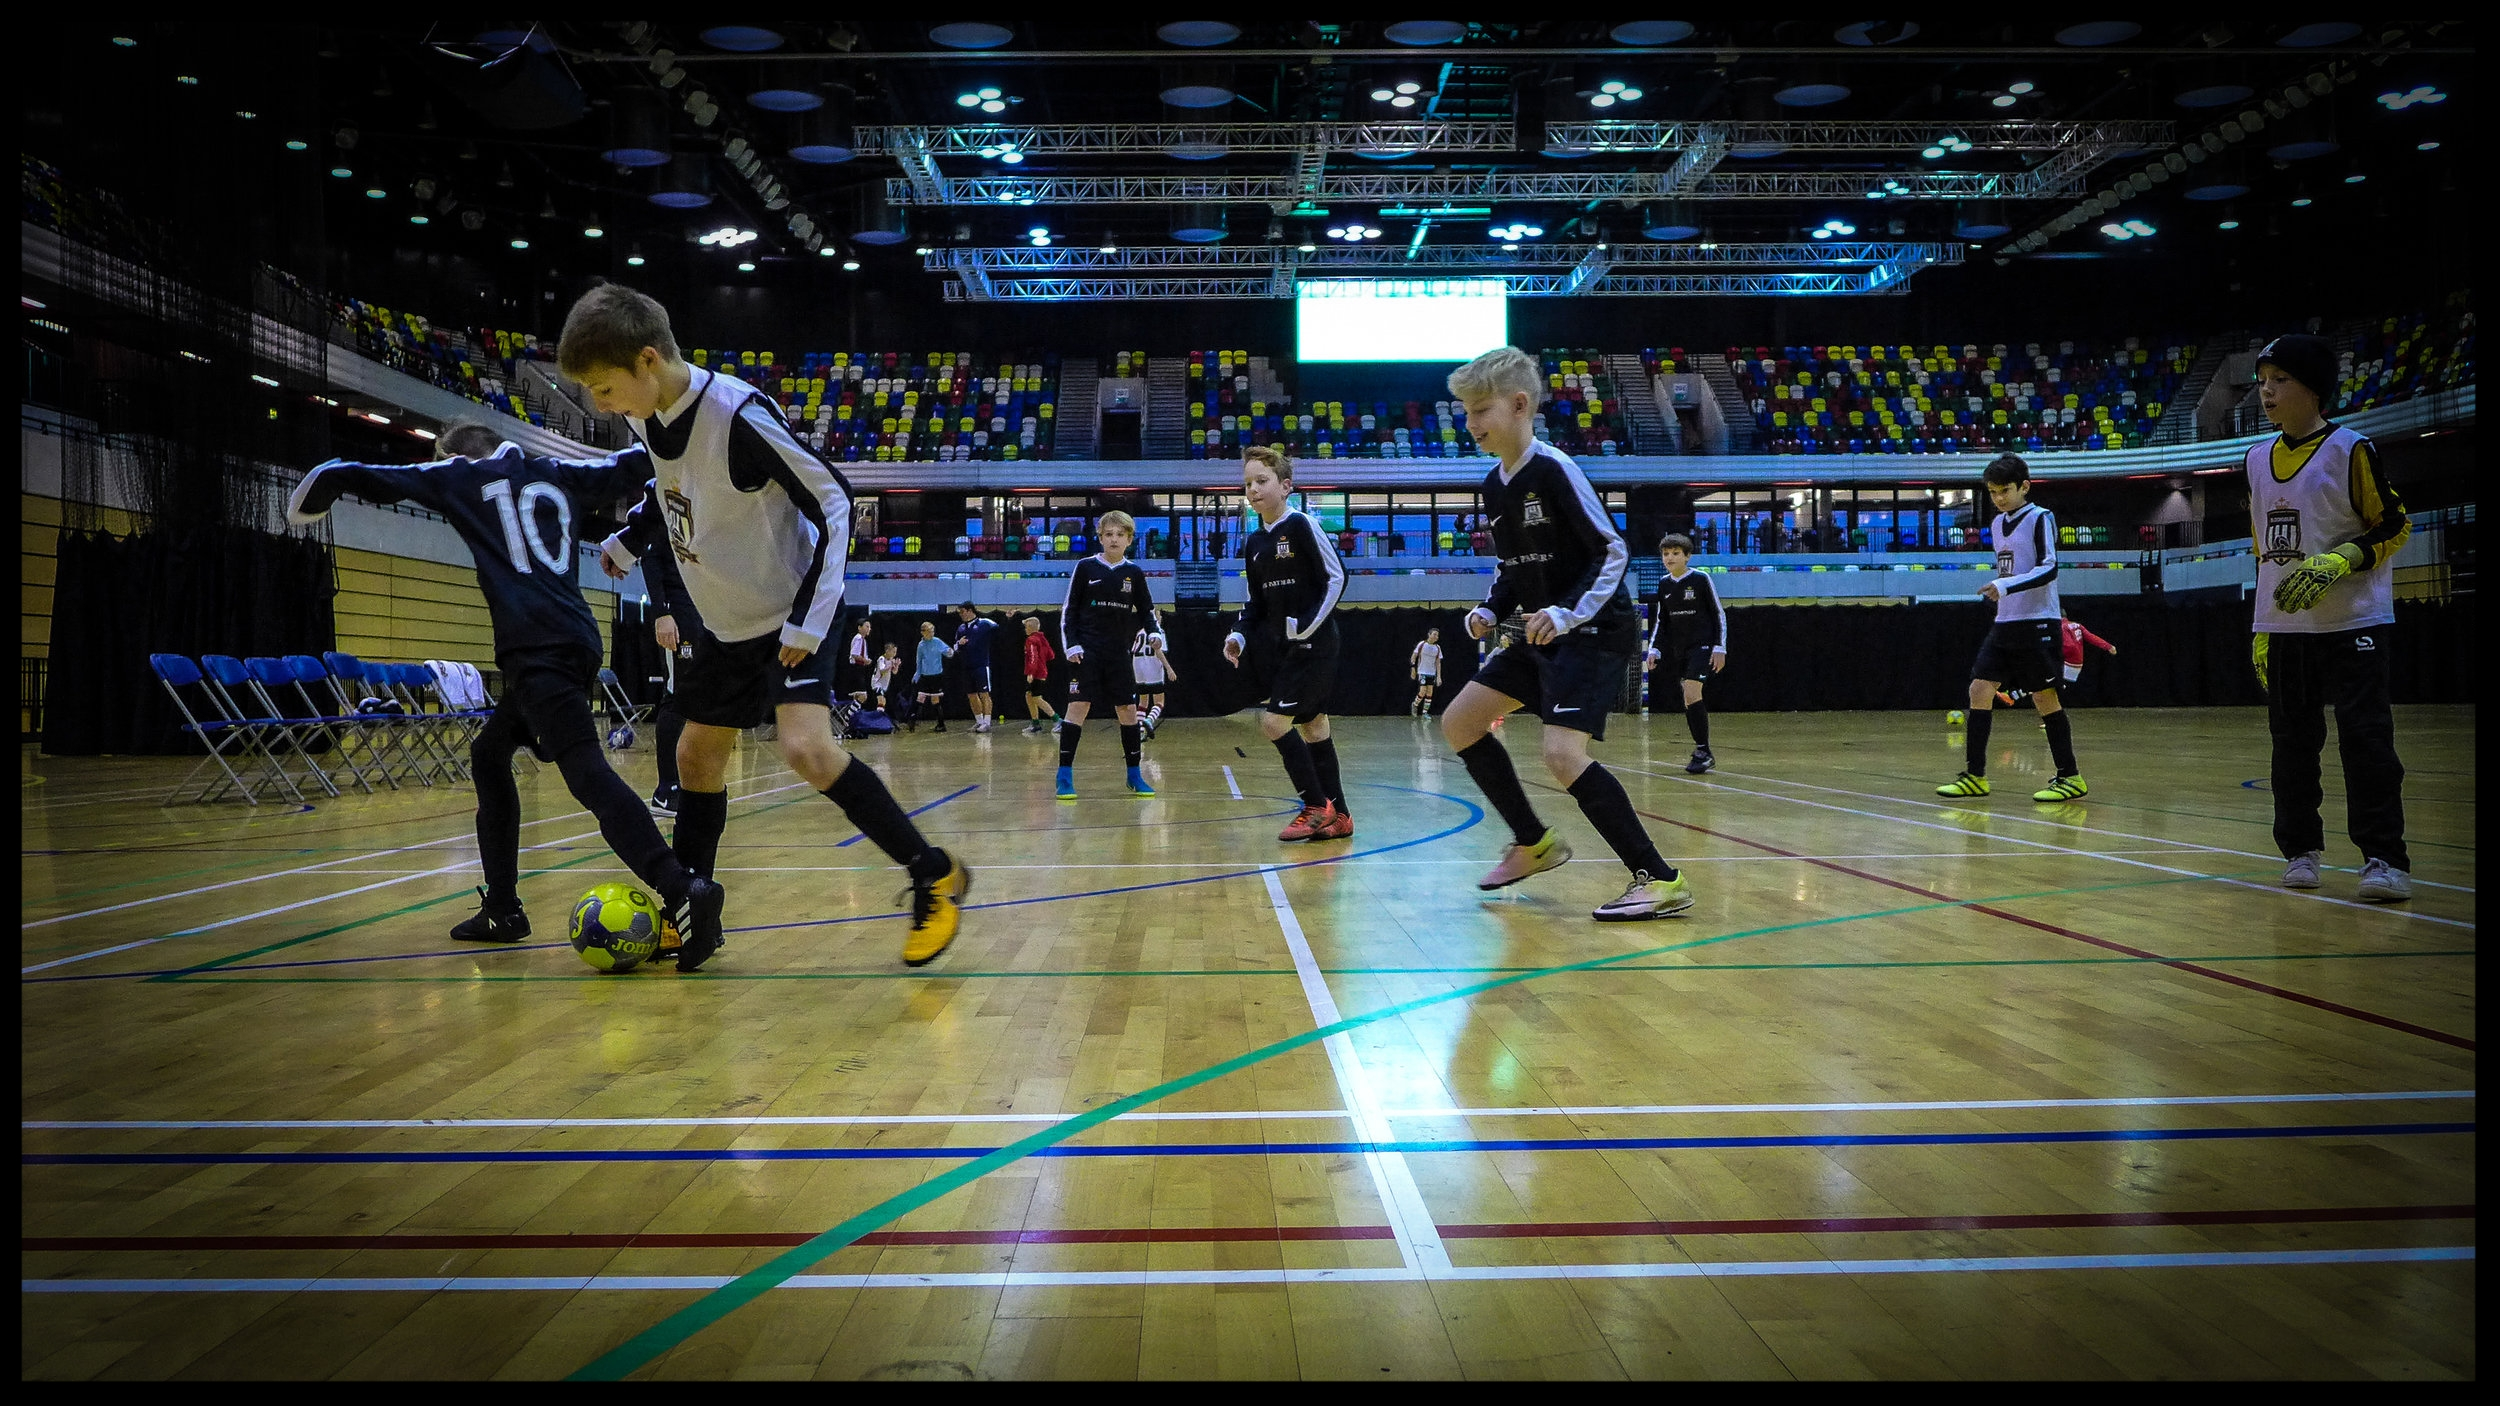 MONDAYS | U9s & U10s - VENUE: UCL ACADEMY, SWISS COTTAGE, NW3 3AQTIME: 17:00-18:00